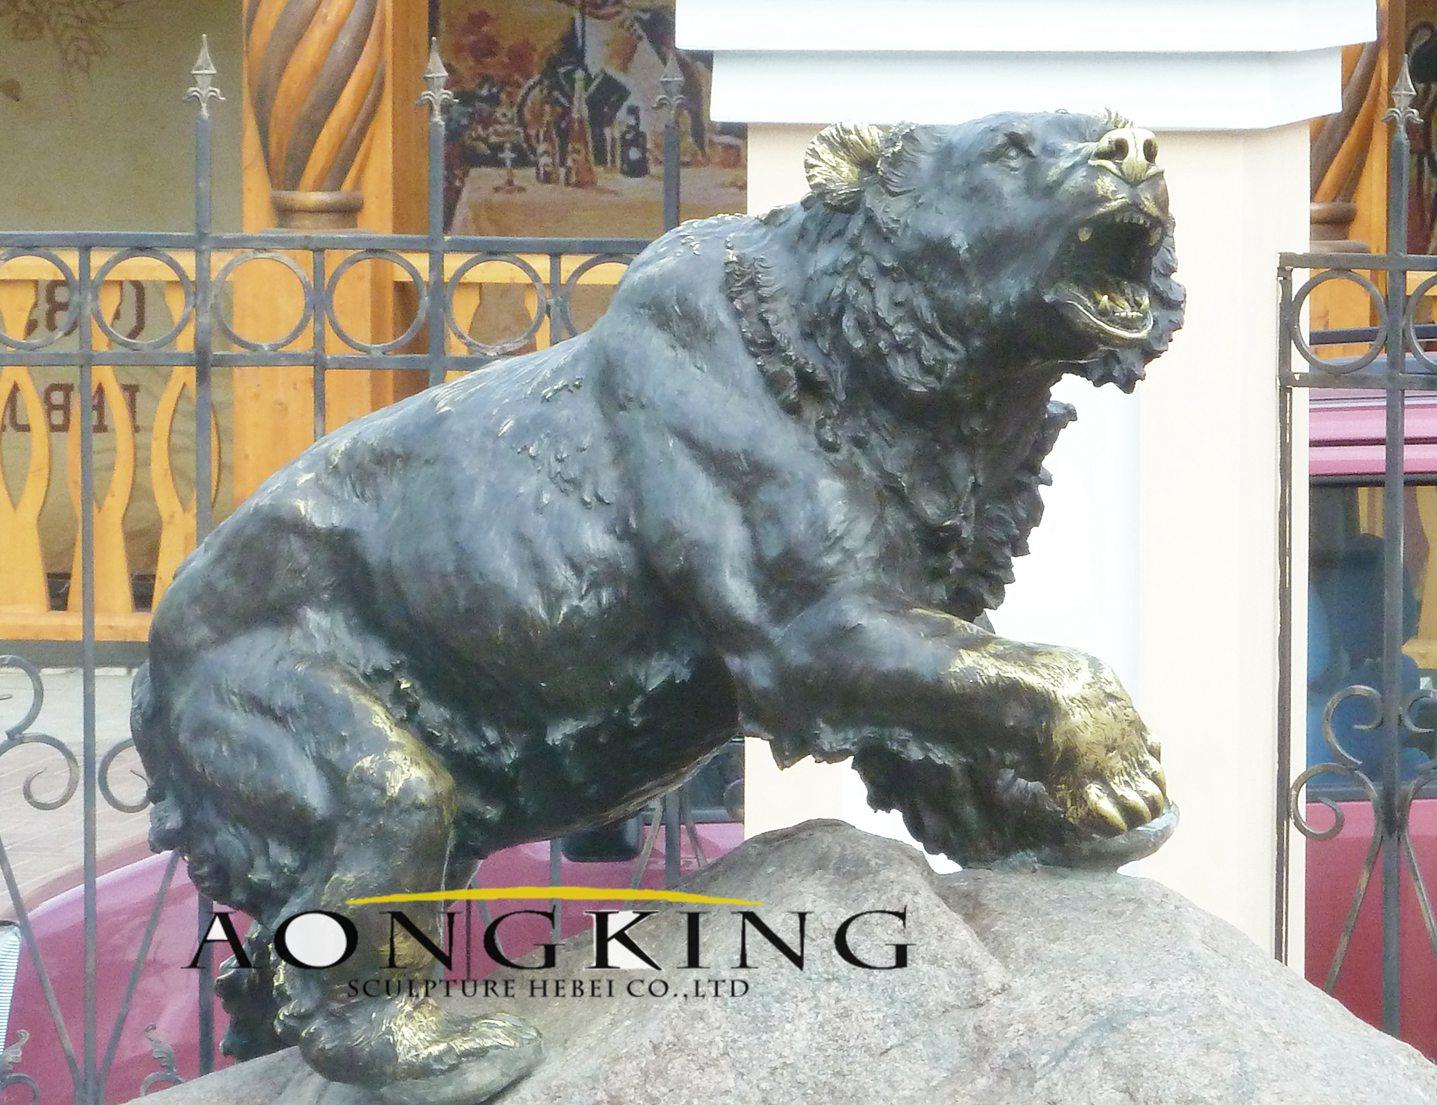 Russia bear statue